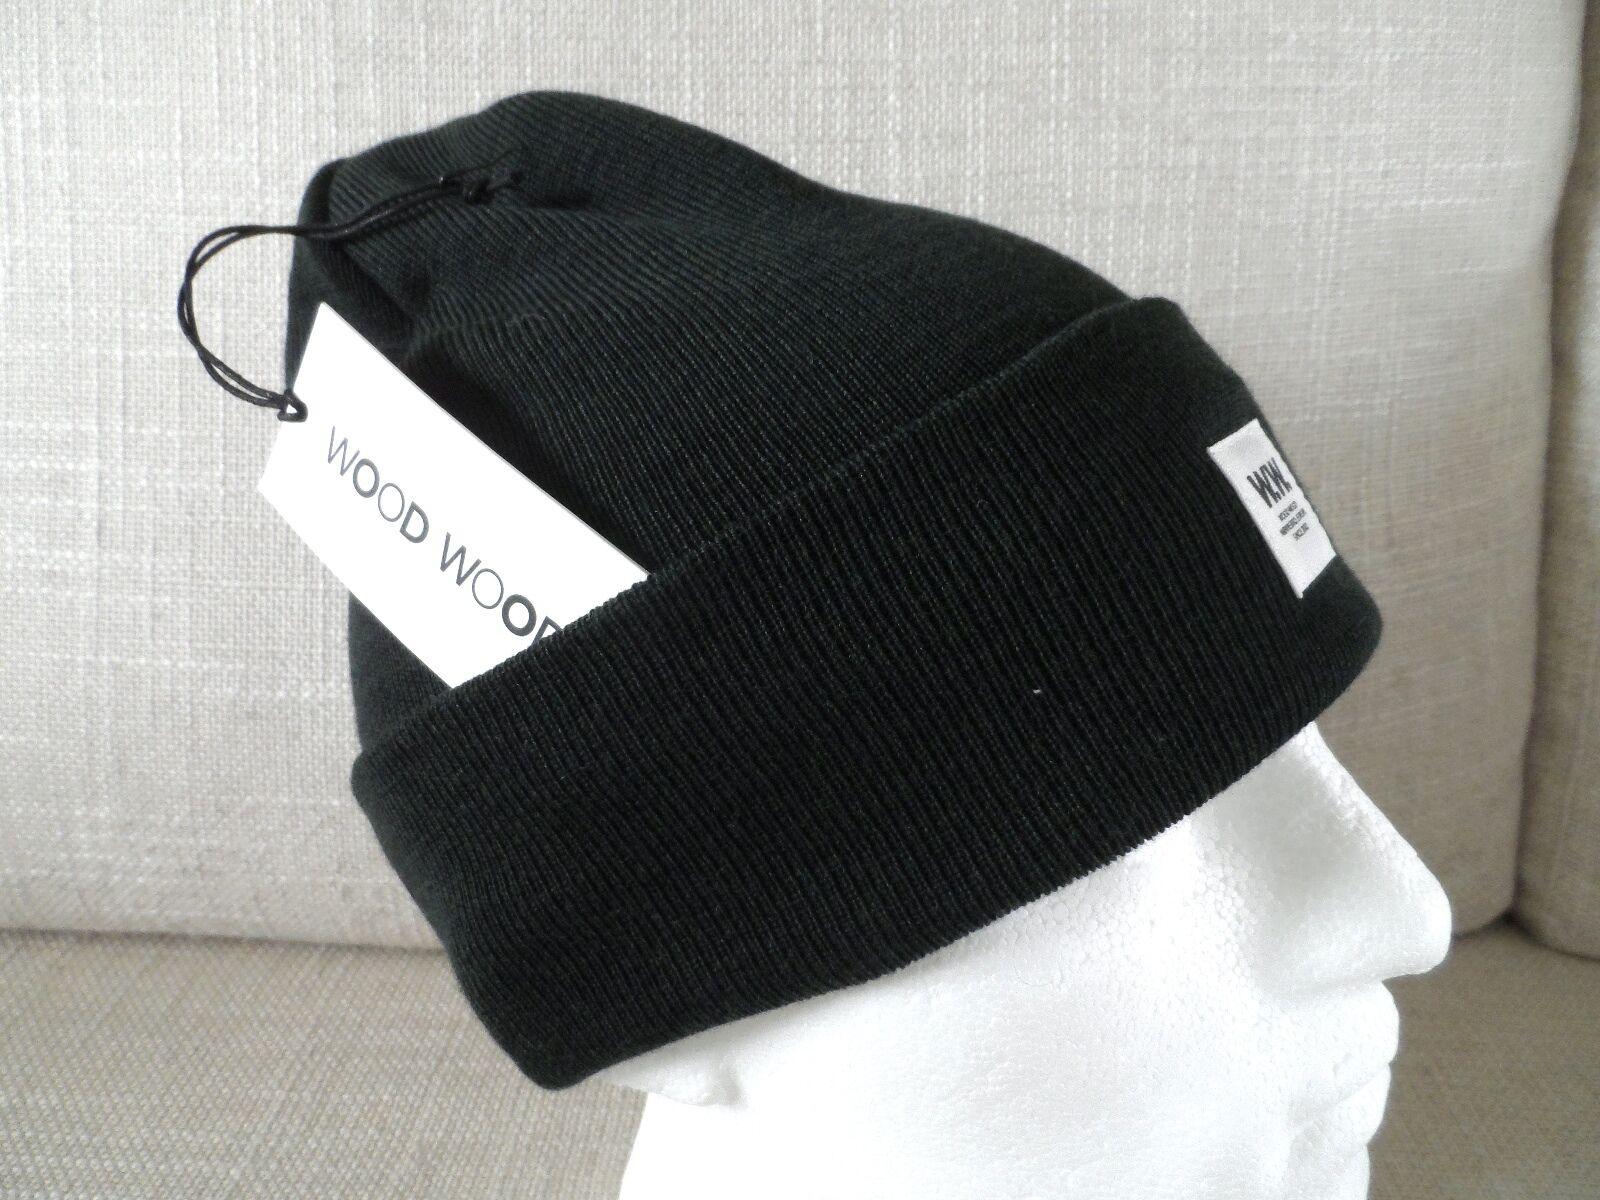 W.W. WOOD WOOD Denmark MERINO Duffel Tasche Cuff Beanie Hat Toque UNISEX TAG